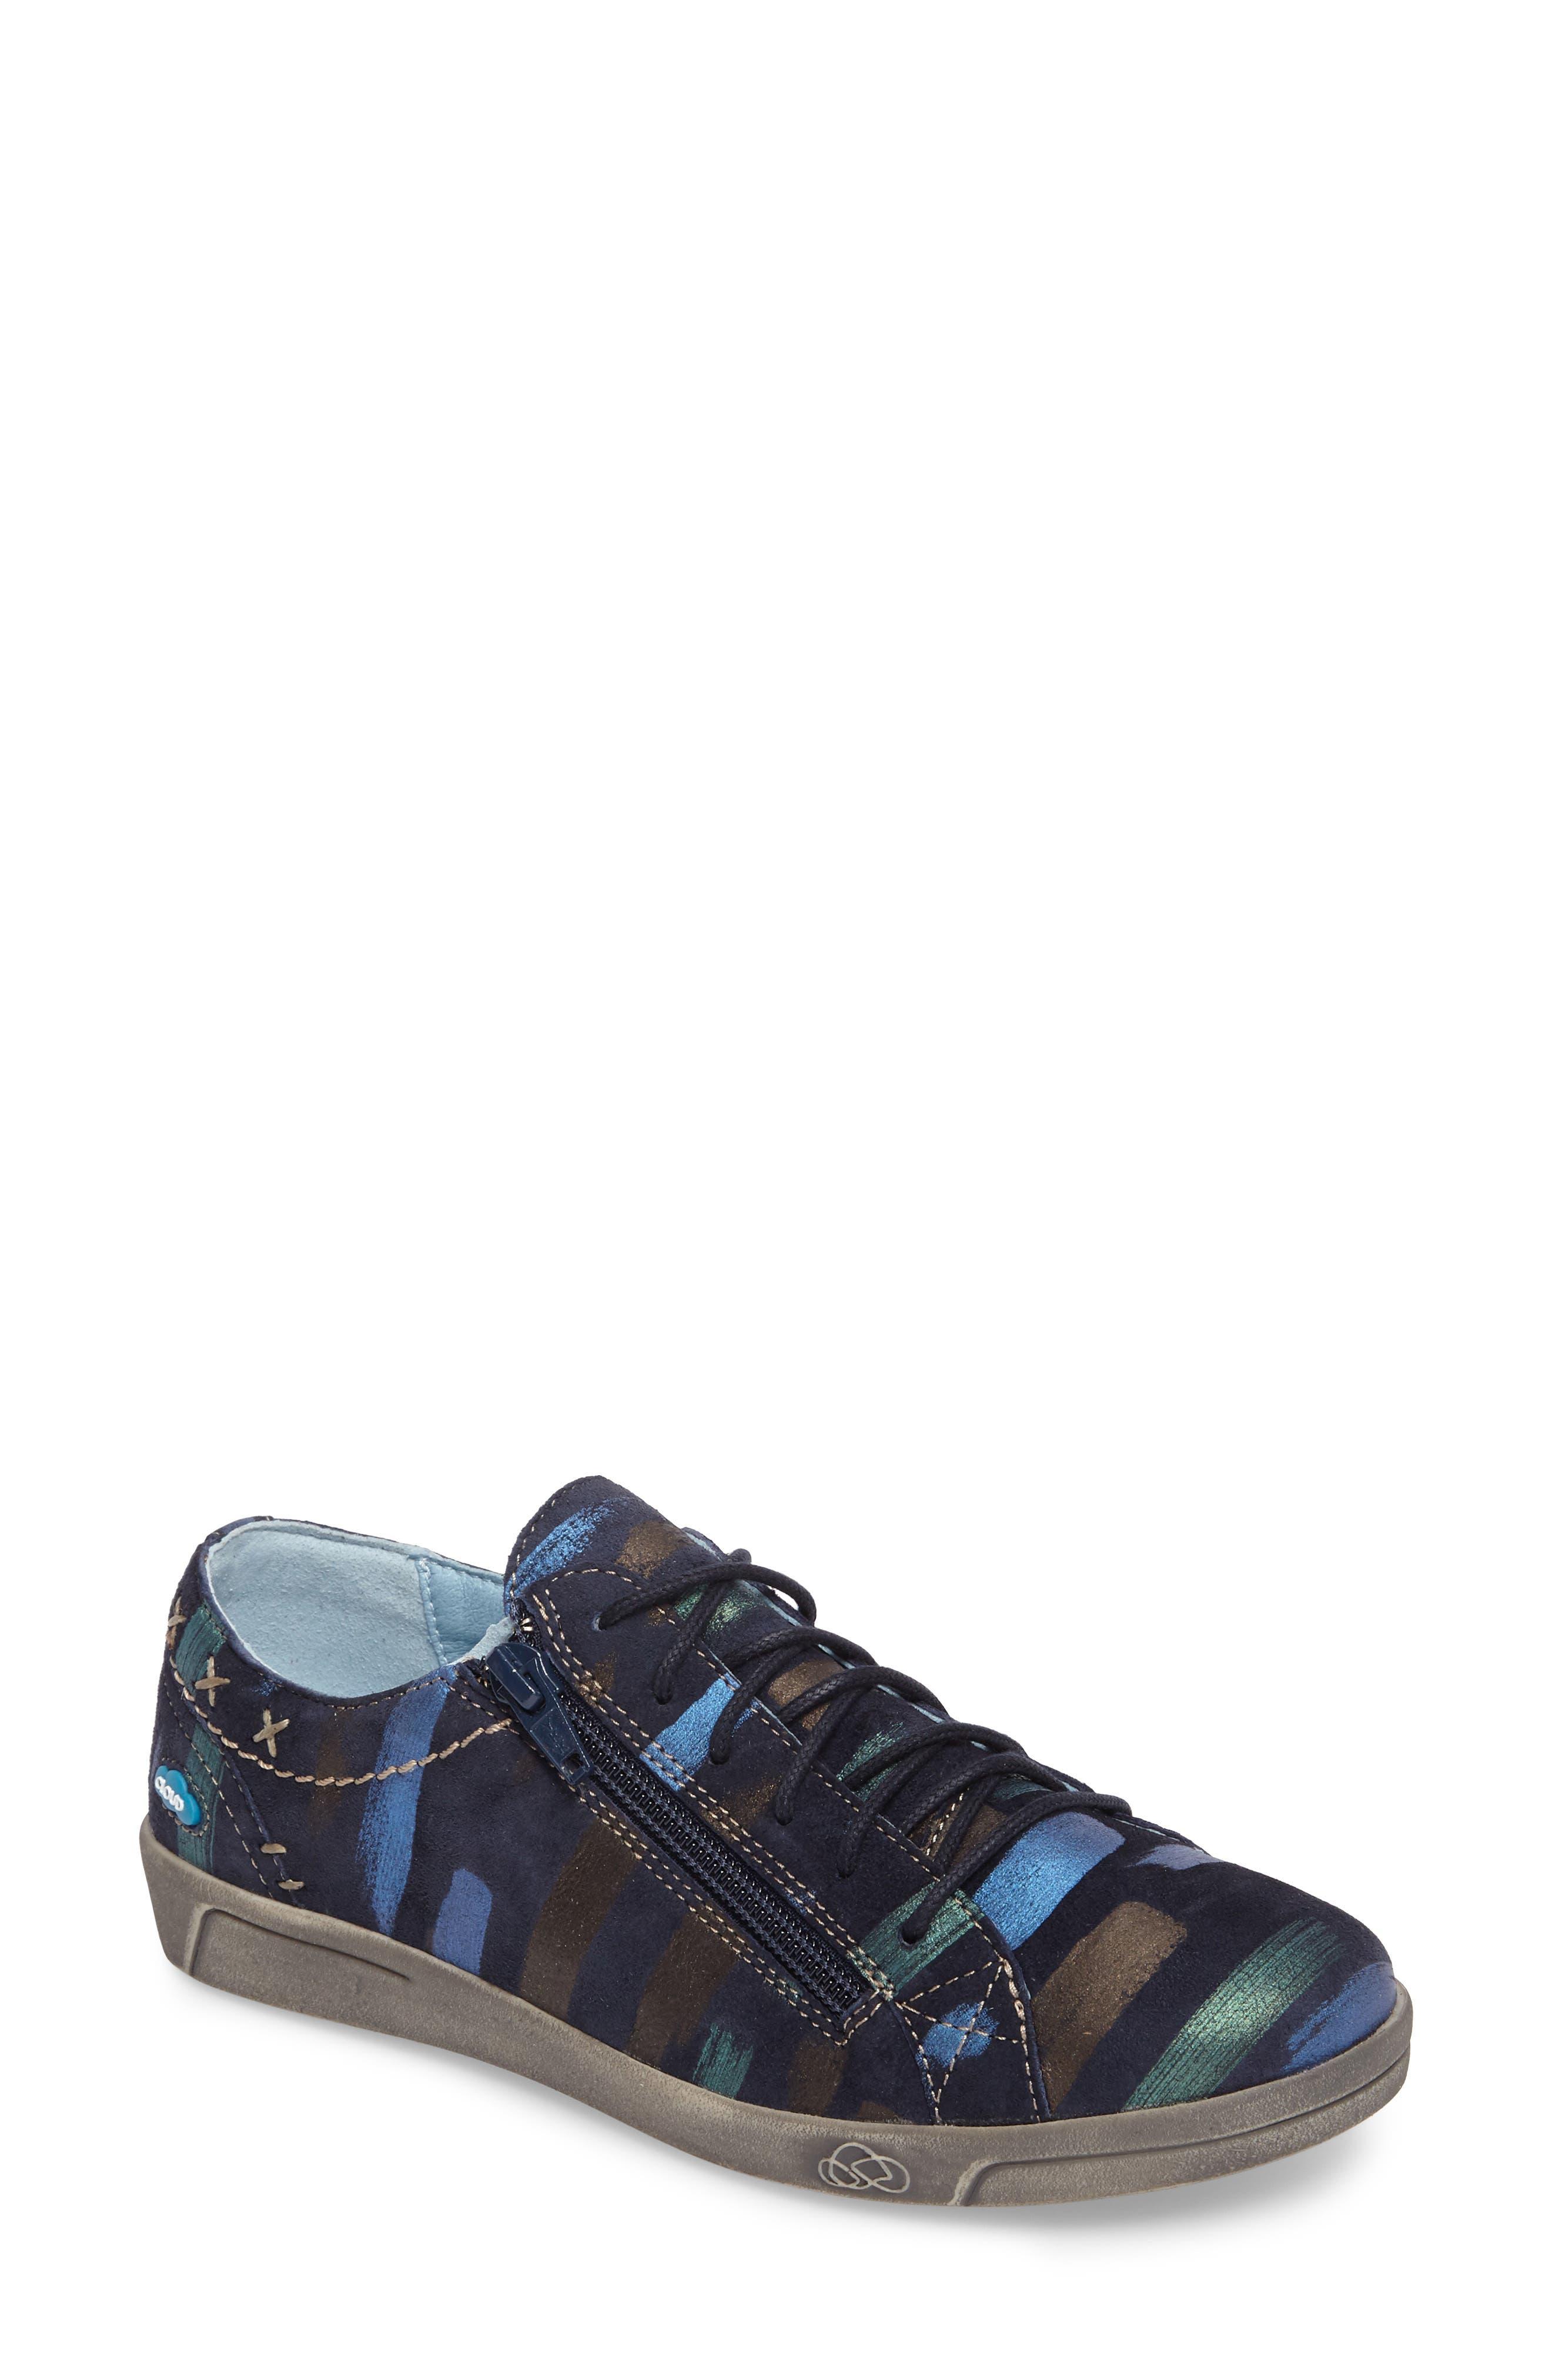 Main Image - CLOUD 'Aika' Leather Sneaker (Women)